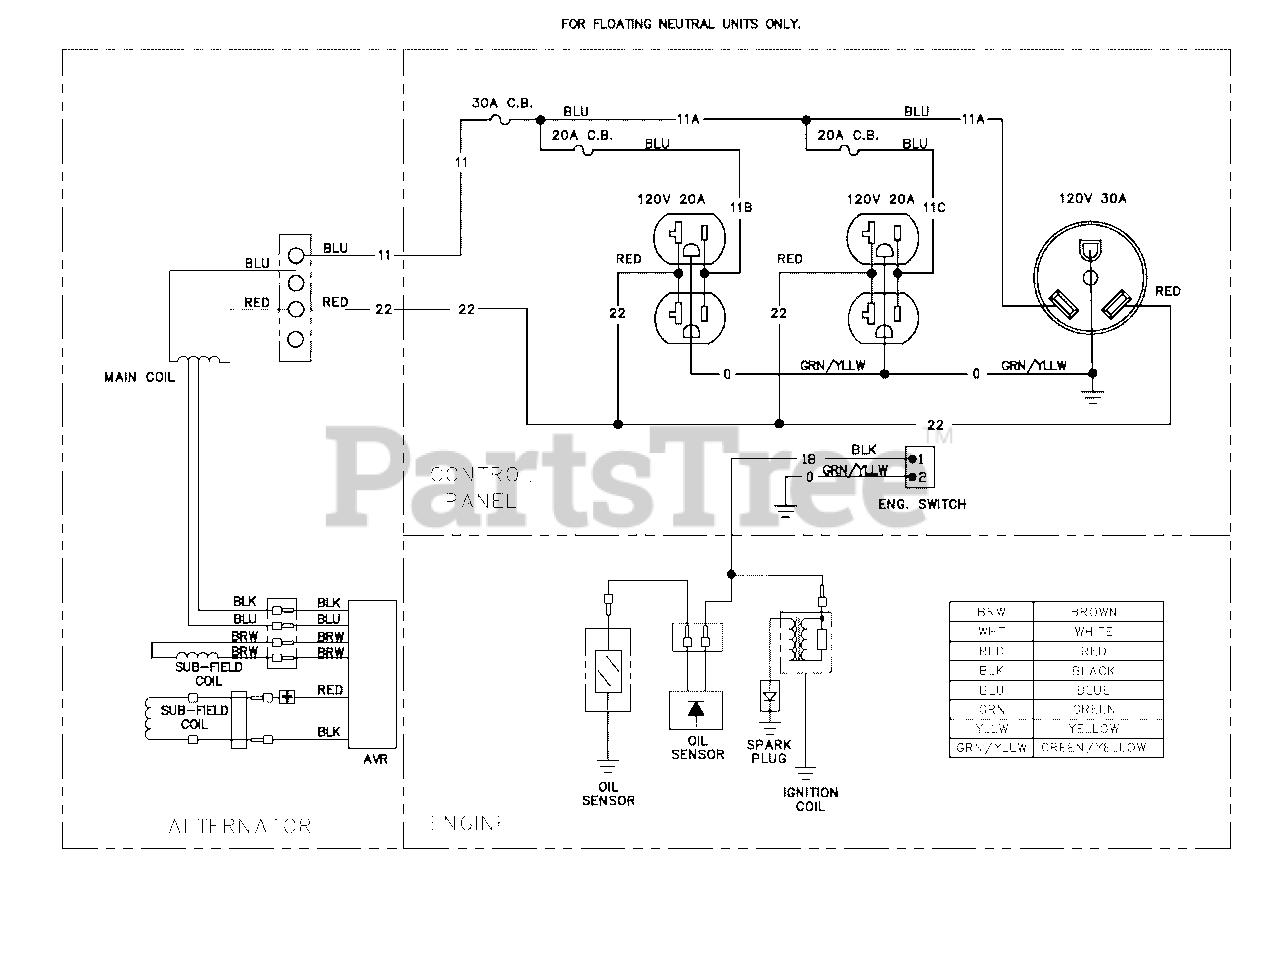 [DIAGRAM_38IS]  Brute 030634-01 - Brute 3,500 Watt Portable Generator Wiring Diagram  (80022856) Parts Lookup with Diagrams | PartsTree | Brute Wiring Diagram |  | PartsTree